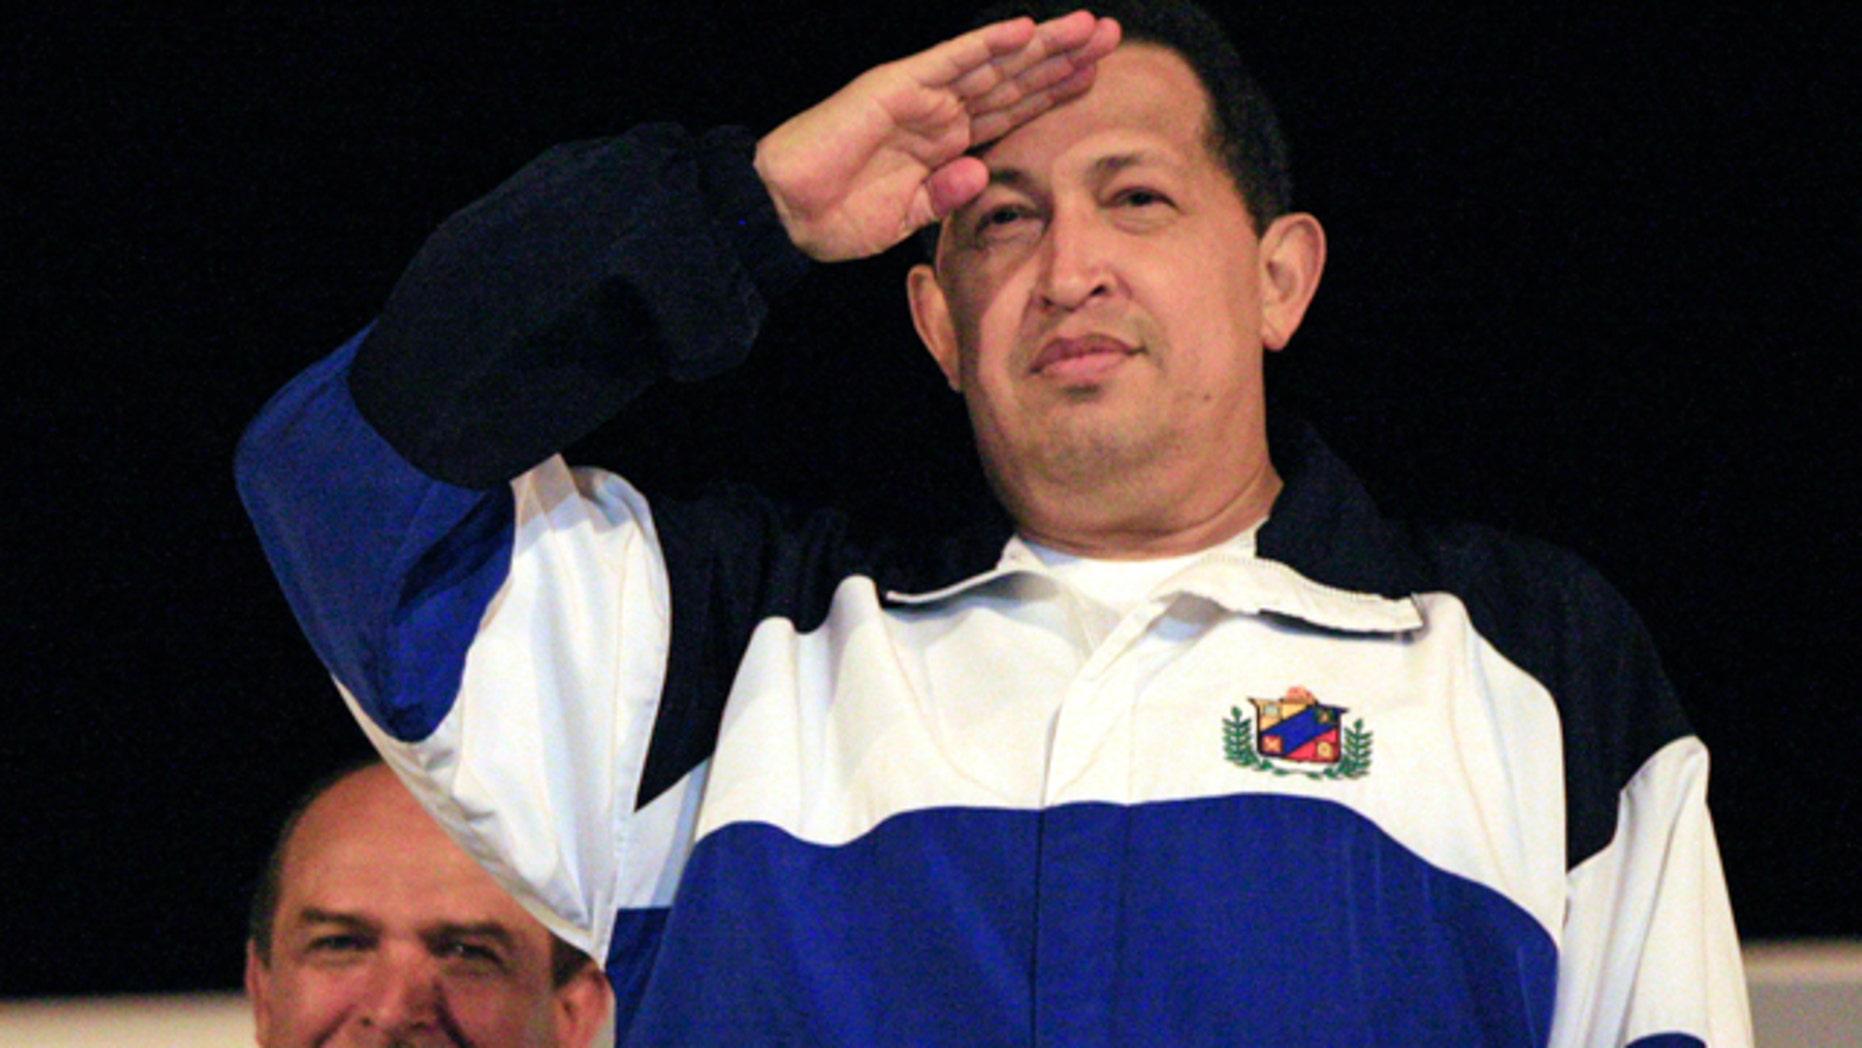 July 4: President Hugo Chavez salutes before his departure to Venezuela from the Jose Marti International Airport in Havana, Cuba.